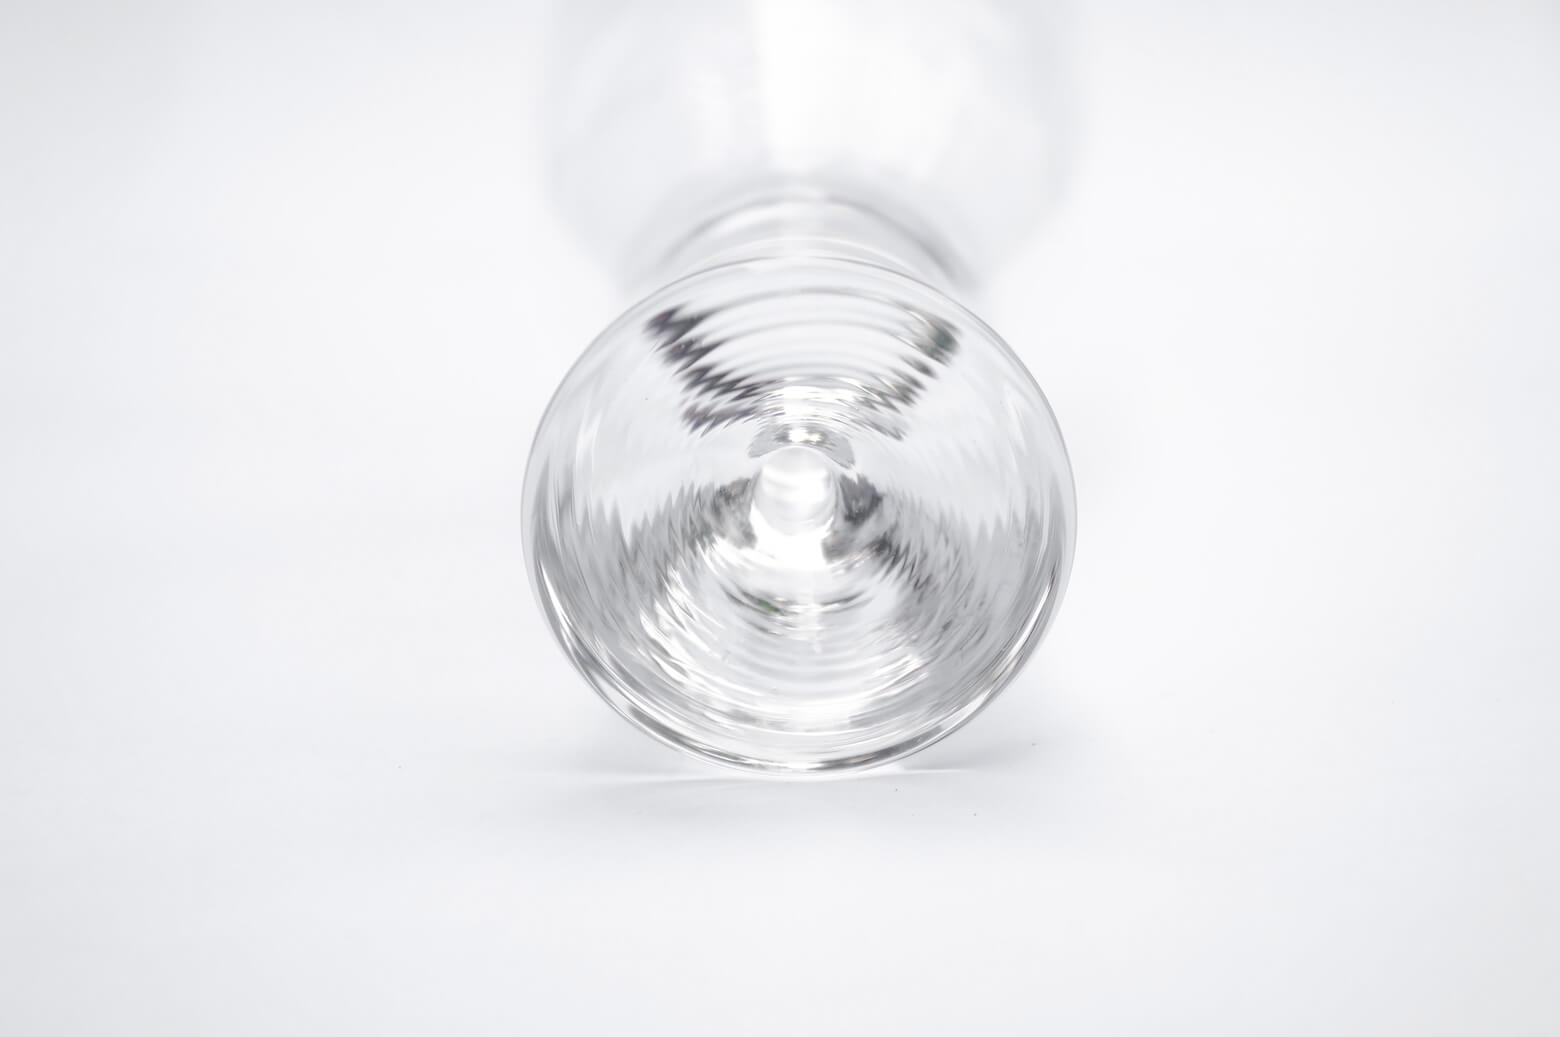 iittala Tapio Wirkkala White Wine Glass /イッタラ タピオ・ヴィルカラ ホワイト ワイン グラス 180ml 北欧食器 フィンランド 4